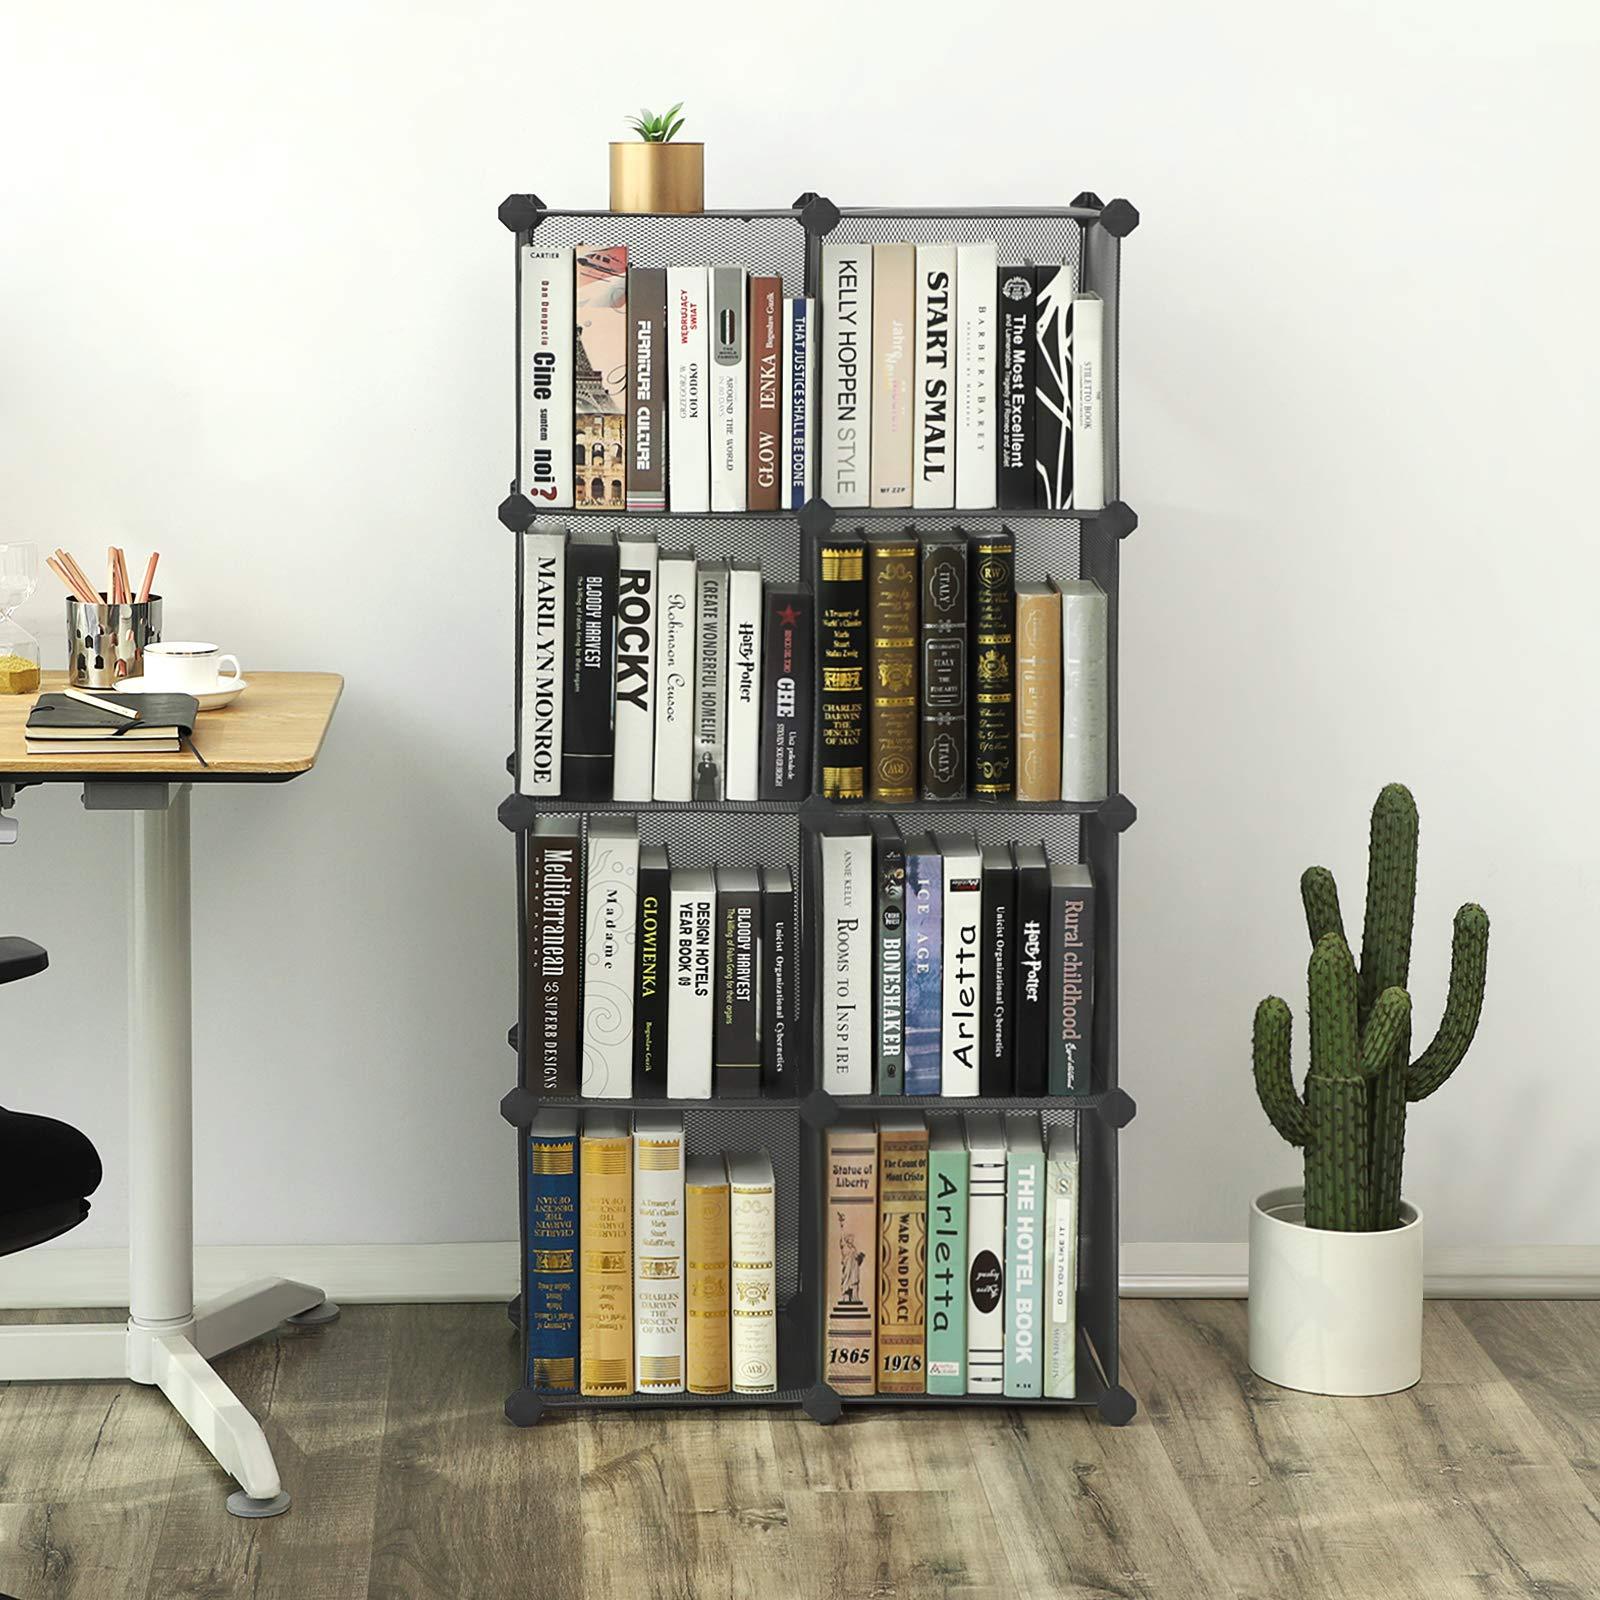 SONGMICS 9-Cube Metal Mesh Storage Cube, Book Shelf, Modular Bookcase, DIY Closet Cabinet Organizer for Books, Plants, Toys, Shoes, Clothes 36.6''L x 12.2''W x 48.4''H, Gray ULPL115G by SONGMICS (Image #3)